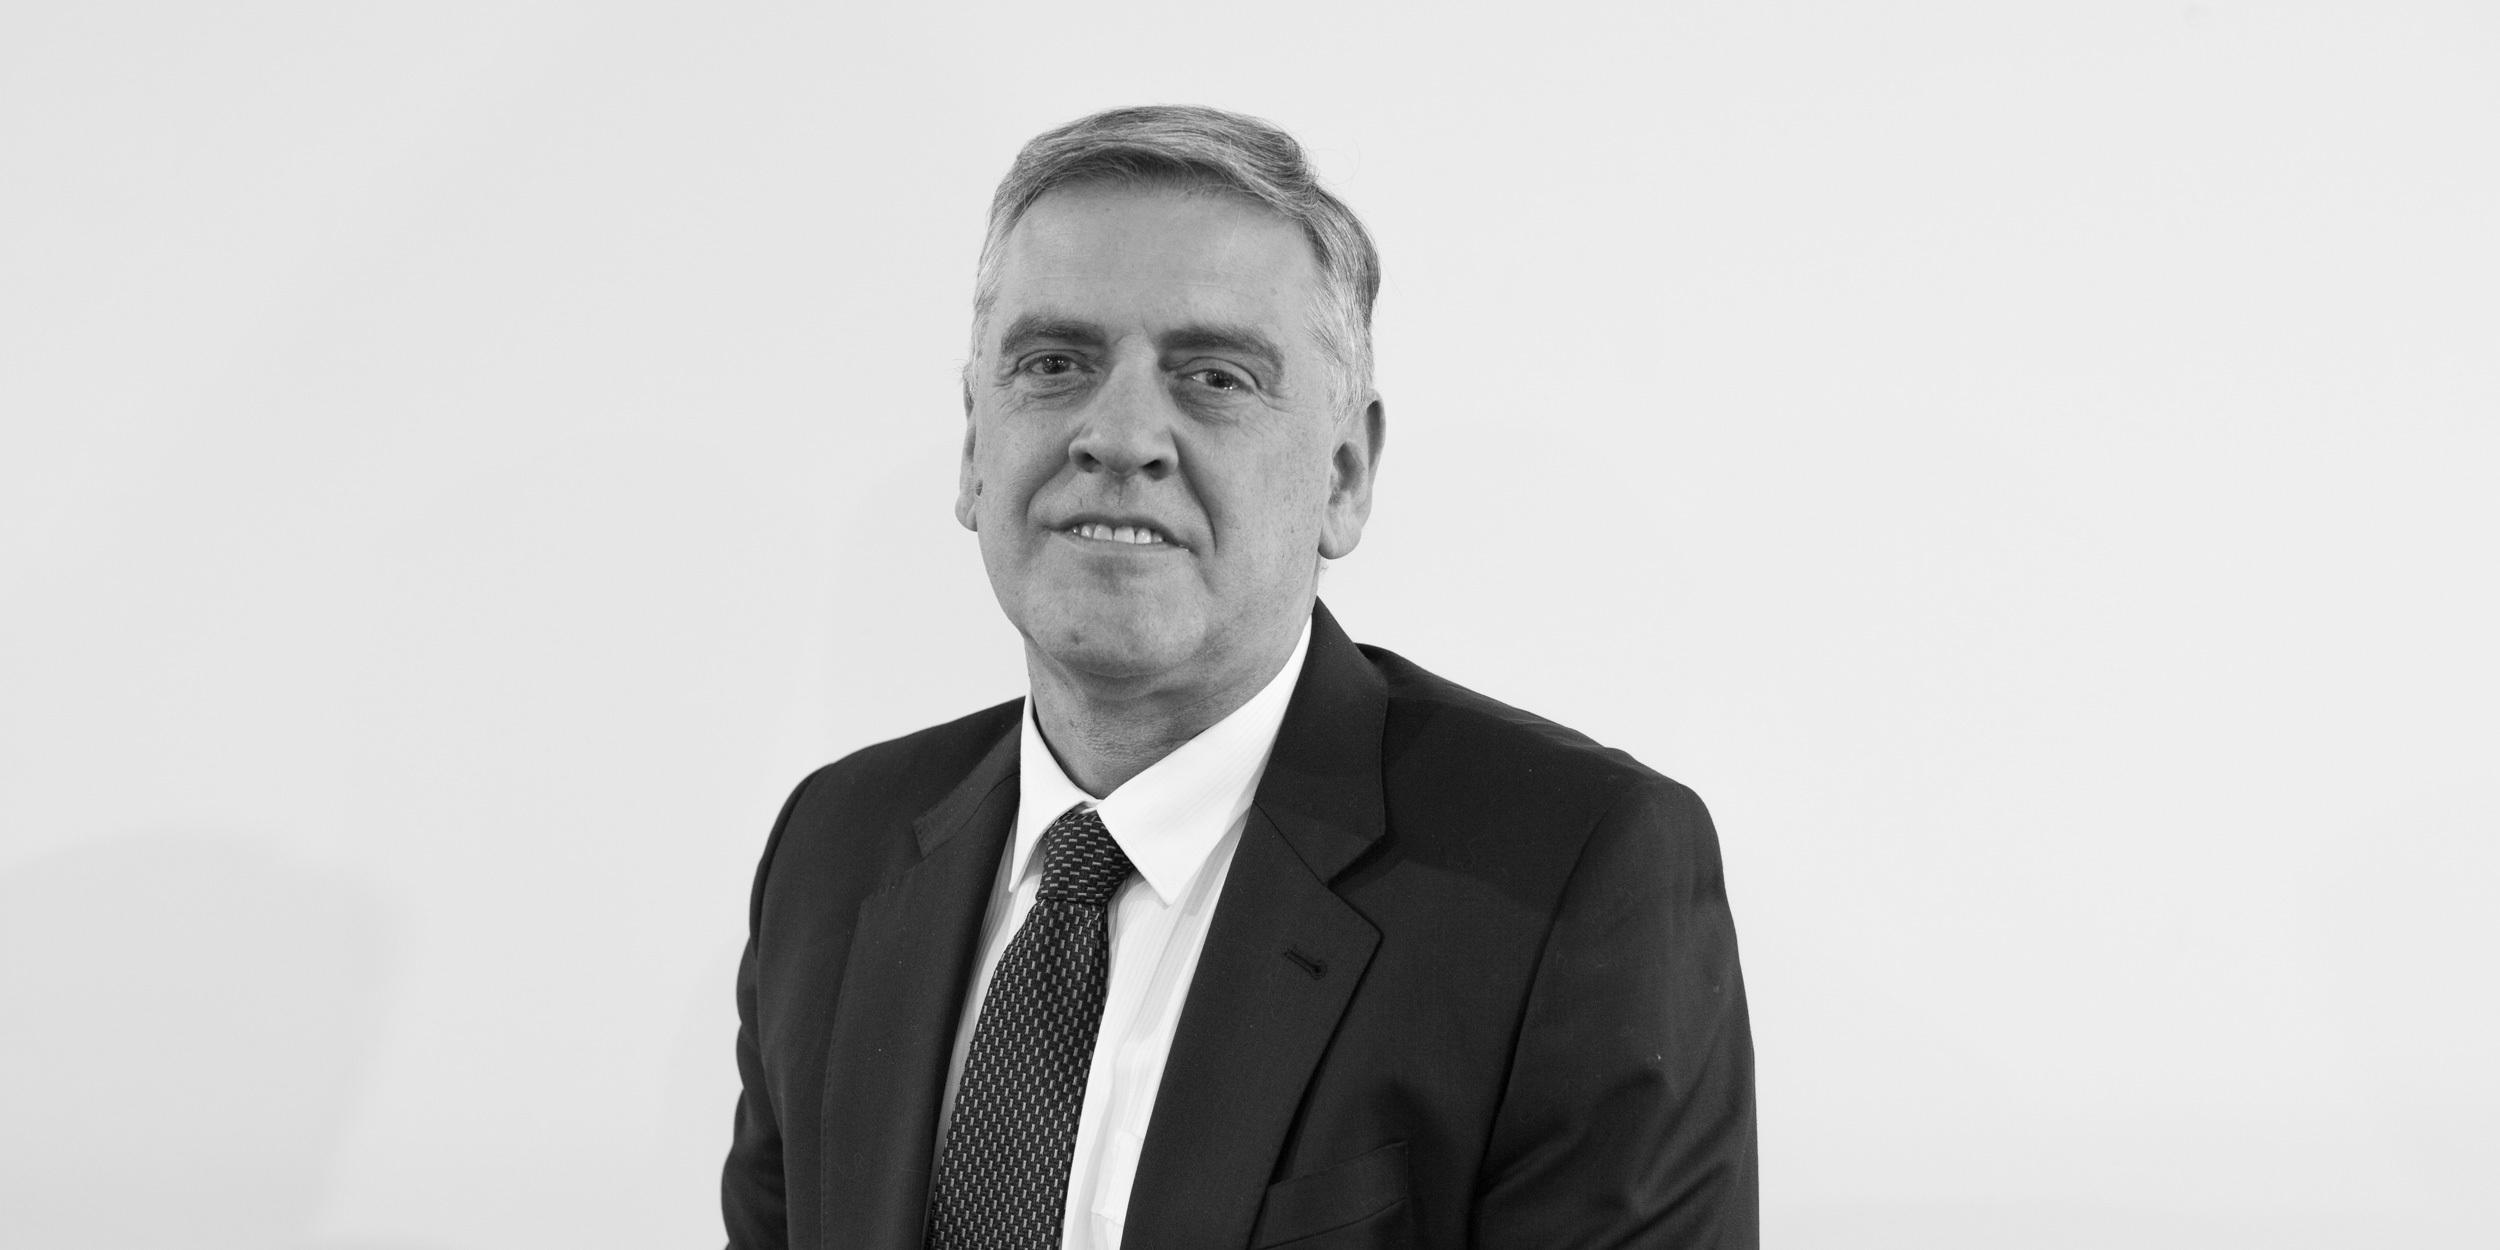 Craig Brogan